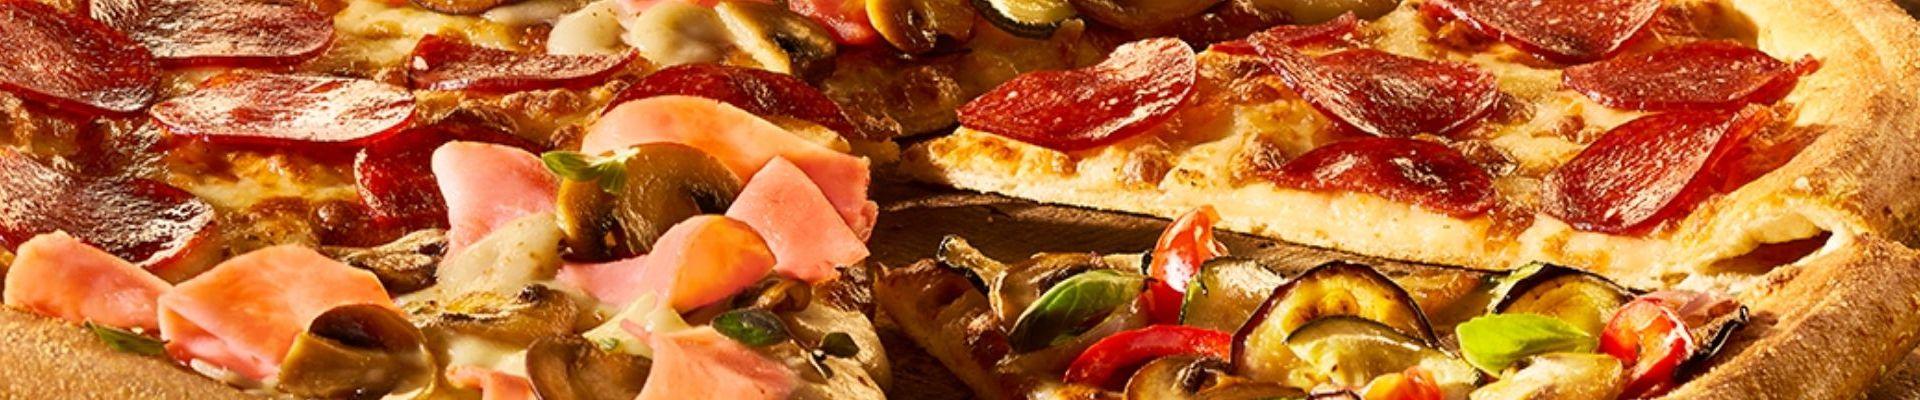 Pizza a domicilio en Valencia